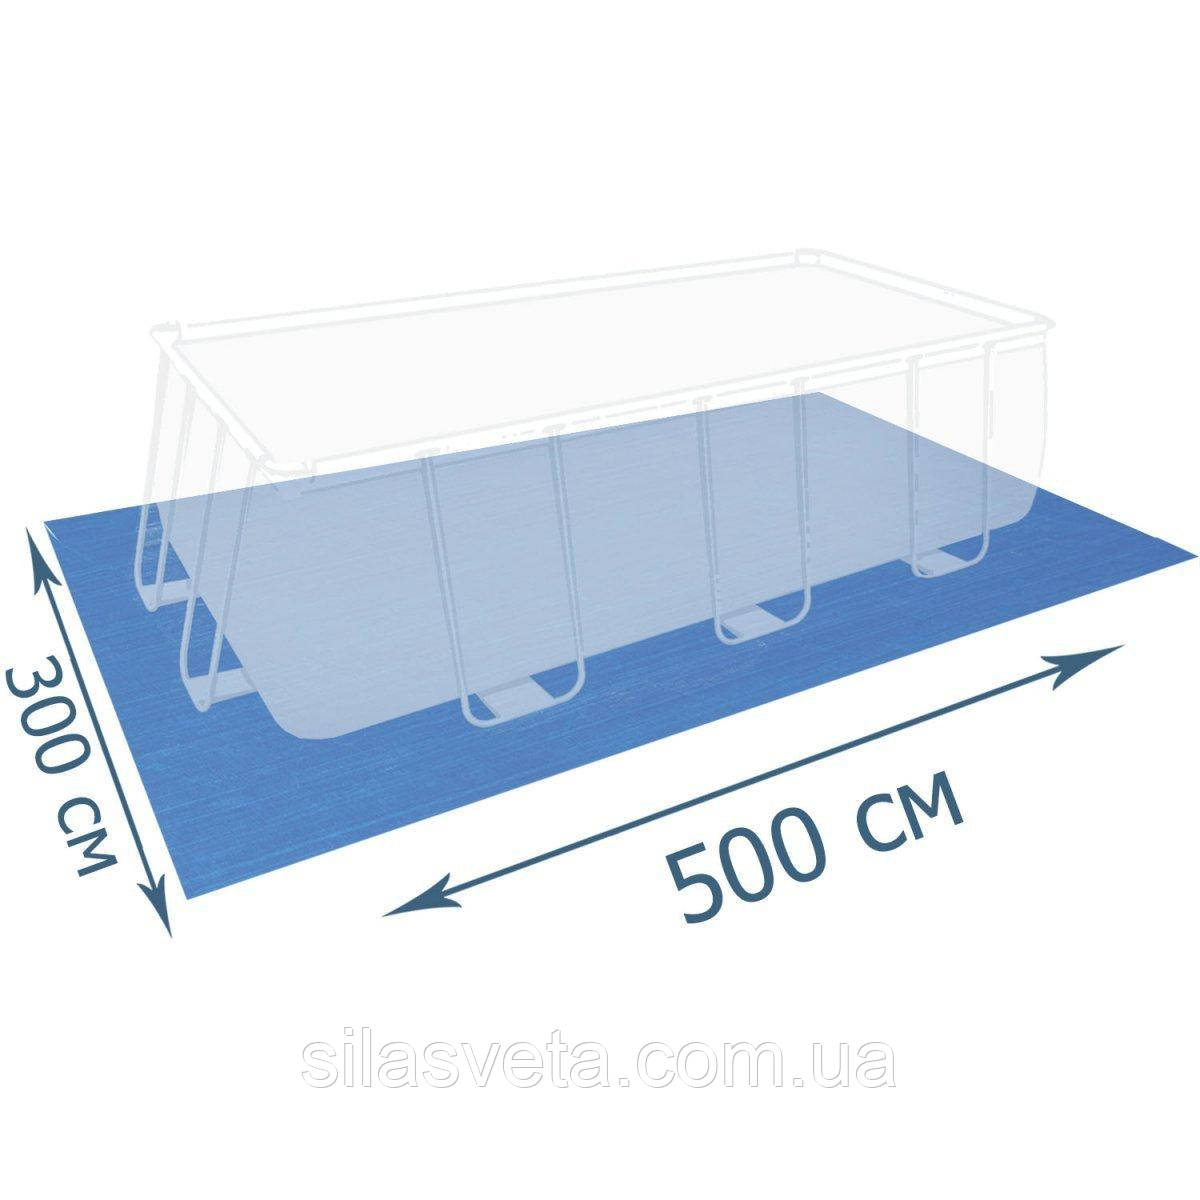 Подстилка для бассейна (тарпаулин) Bestway 58264 (500х300 см.)